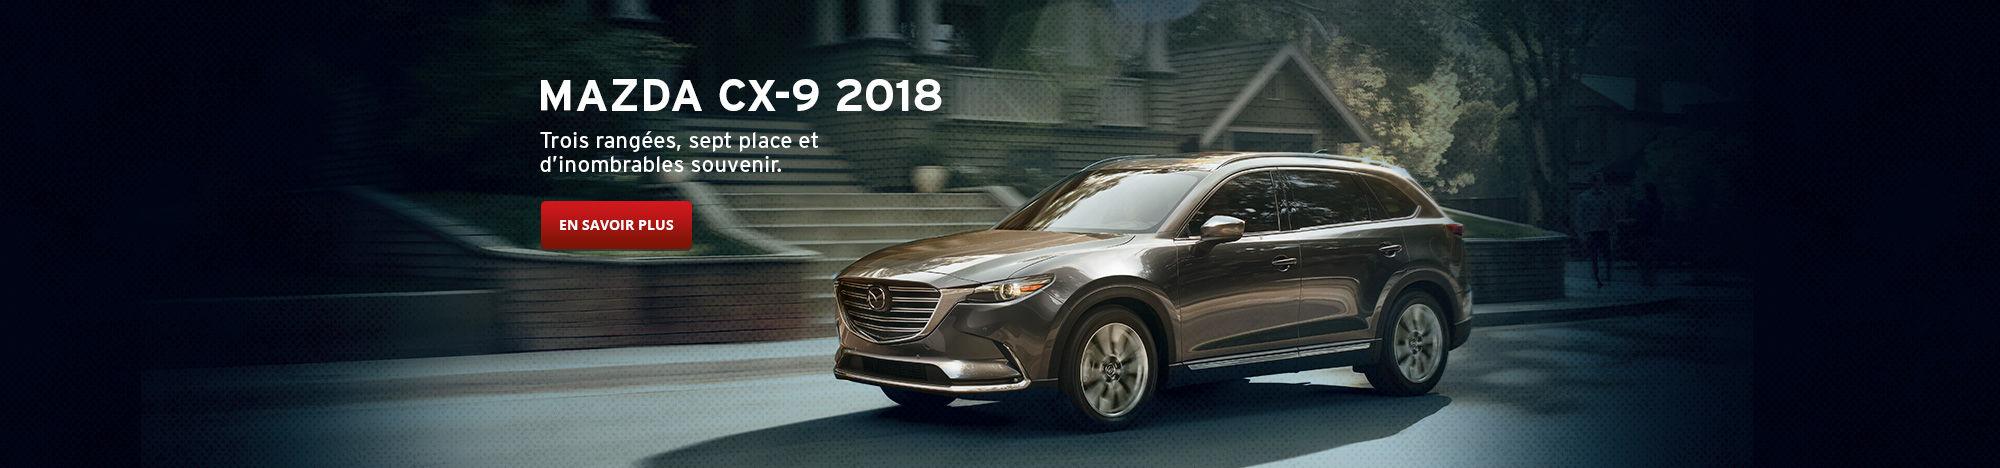 CX-9 2018